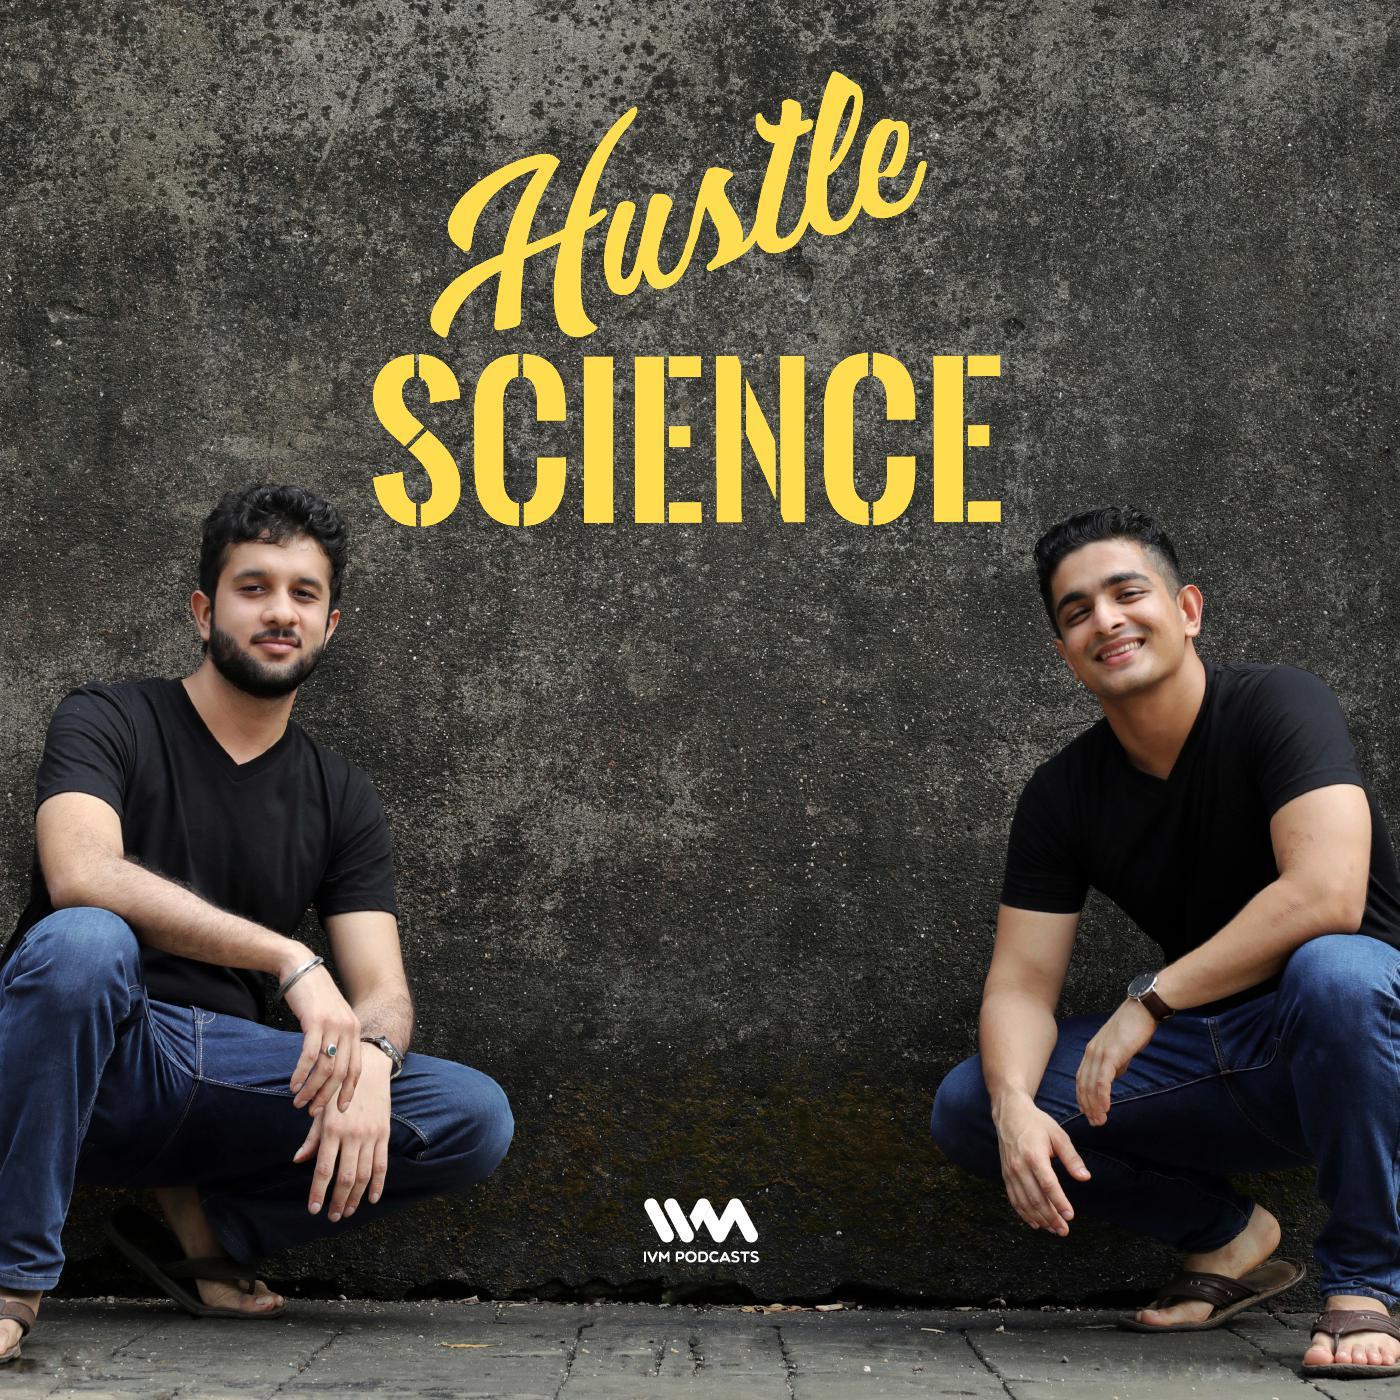 Hustle Science |